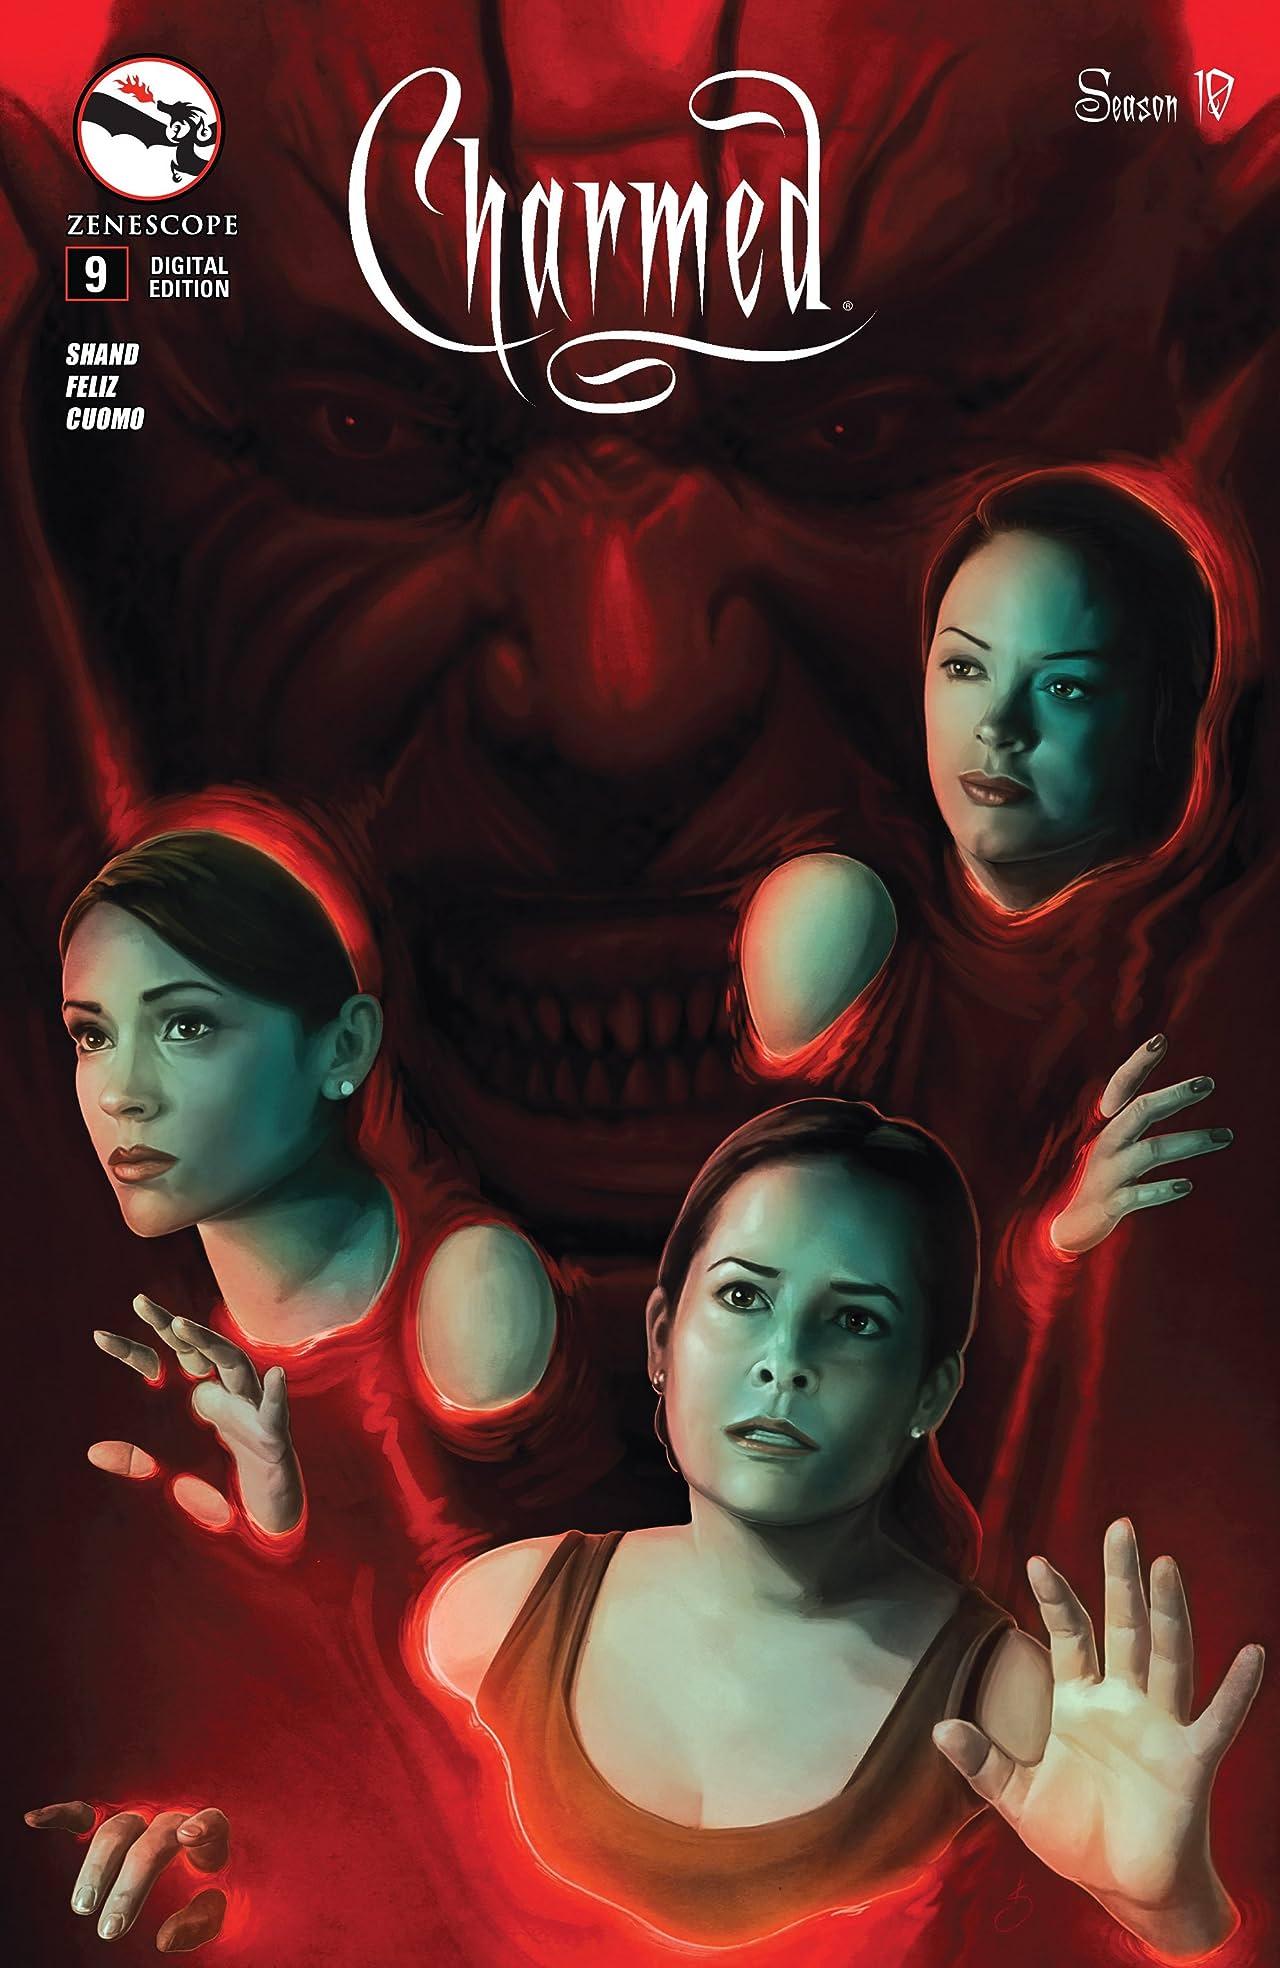 Charmed: Season 10 #9